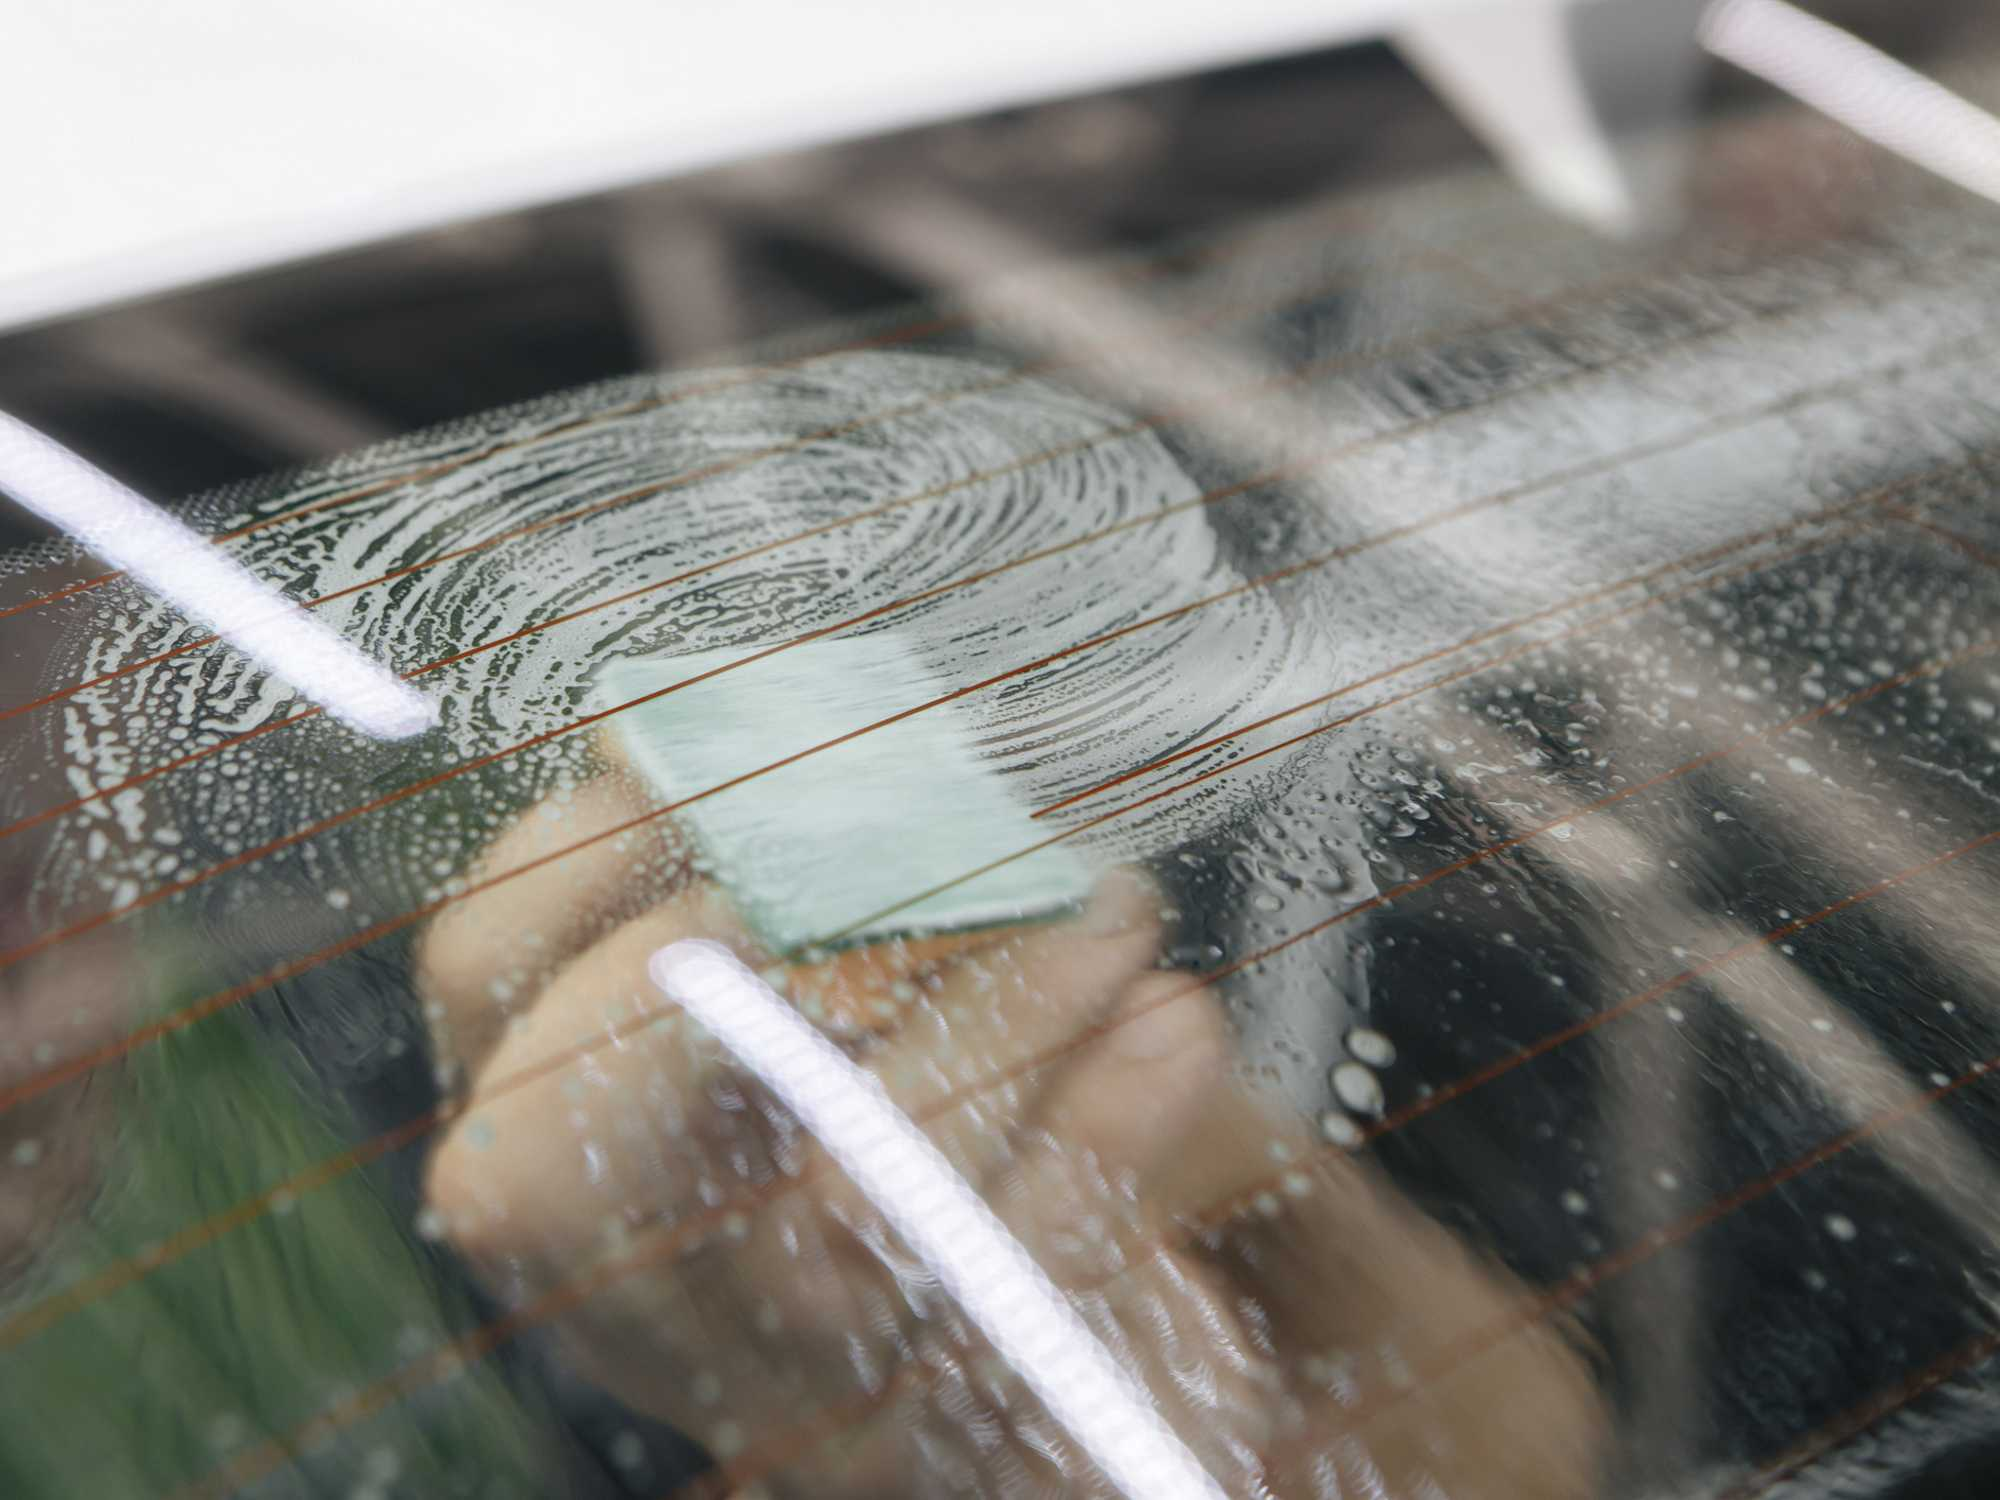 using steel wool to remove window tint adhesive